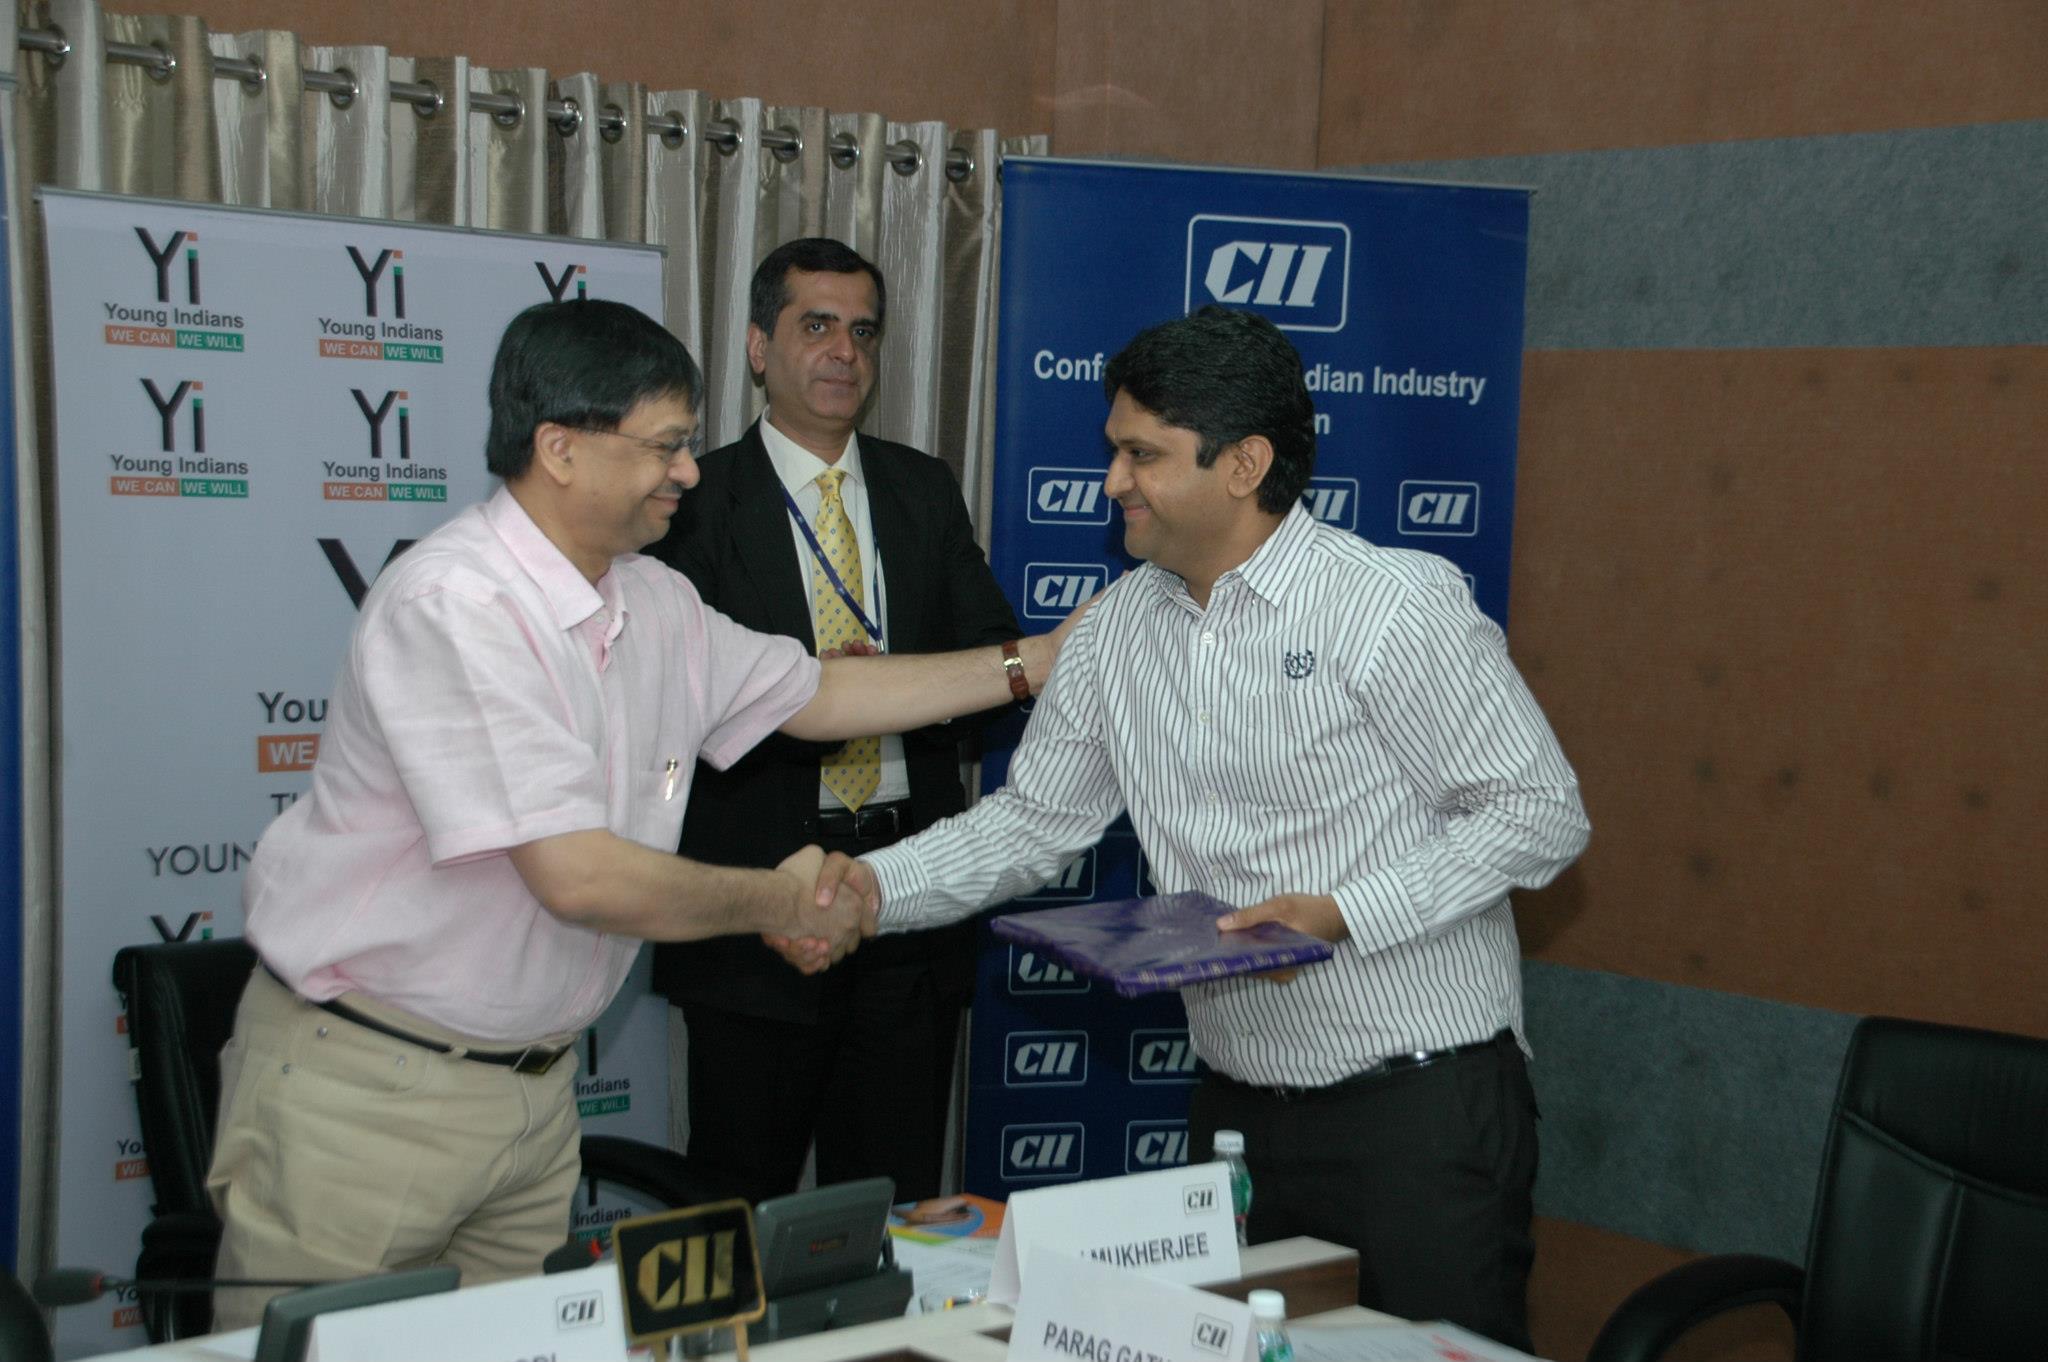 Rajiv Modi, CMD Pharmaceuticals, Yi Ahmedabad, Rajiv I Modi, Rajeev Modi